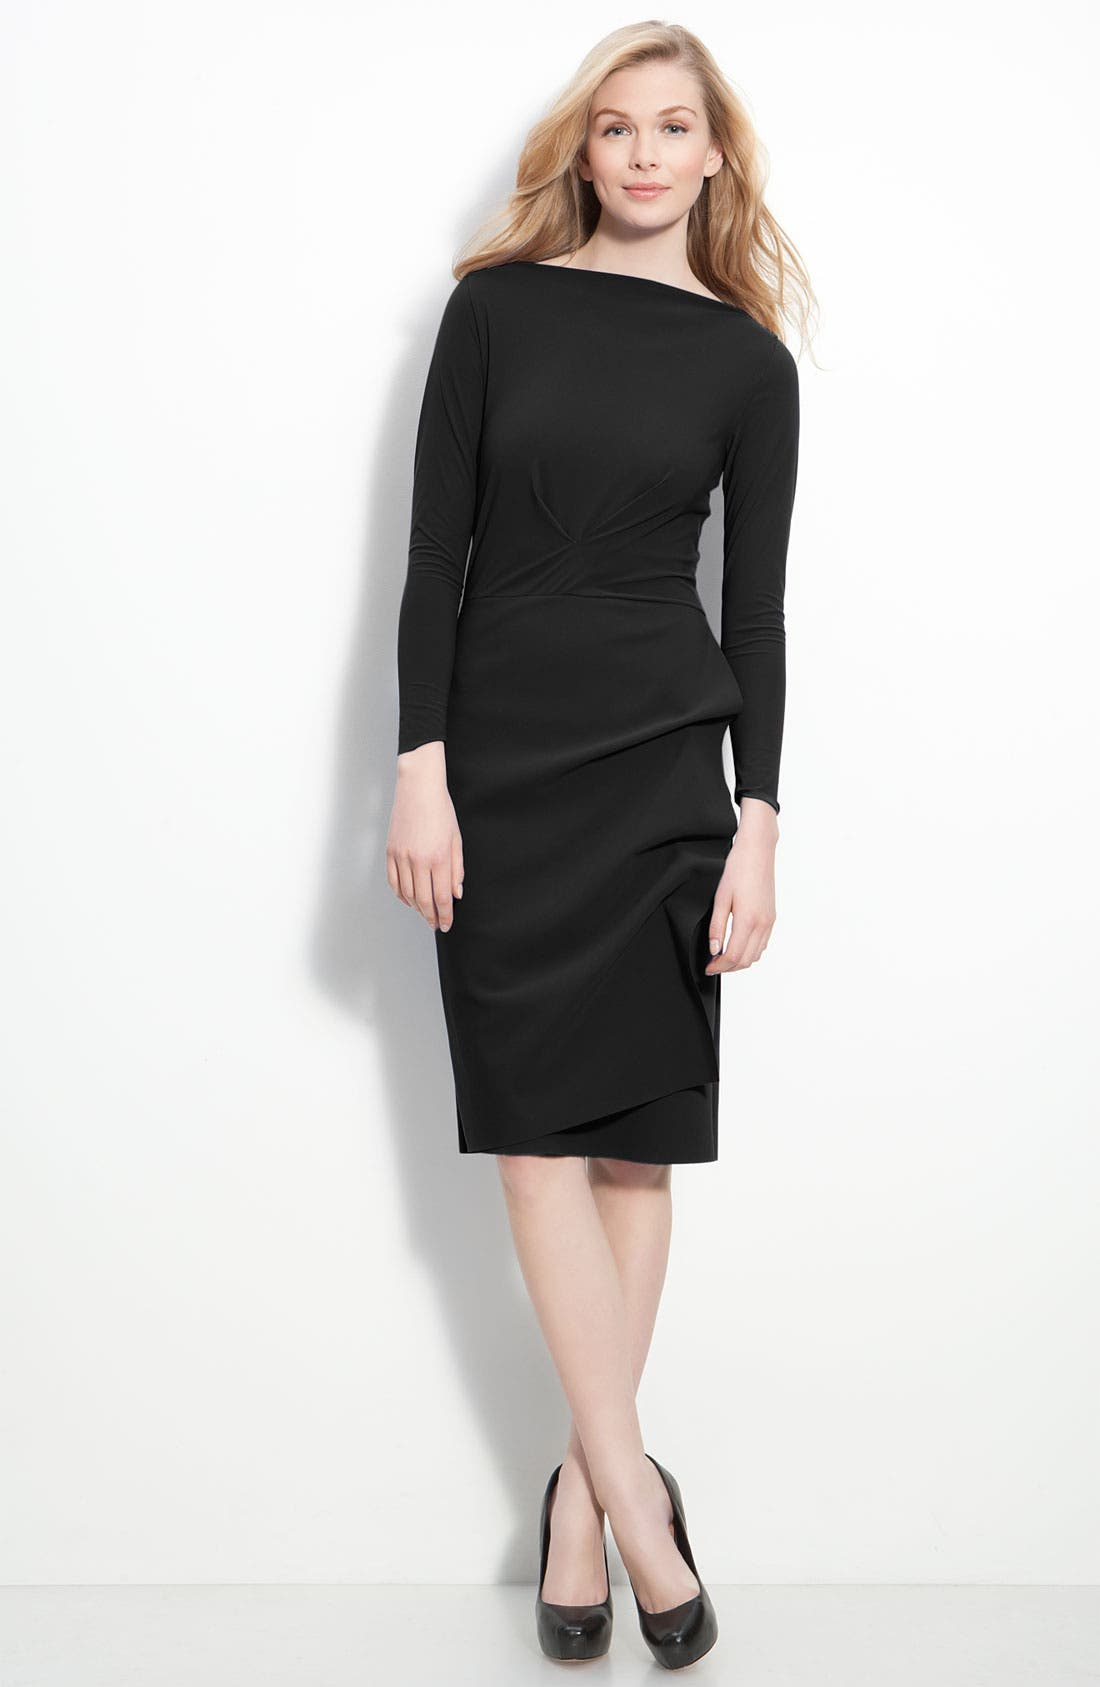 Alternate Image 1 Selected - La Petite Robe by Chiara Boni 'Cassandra' Dress